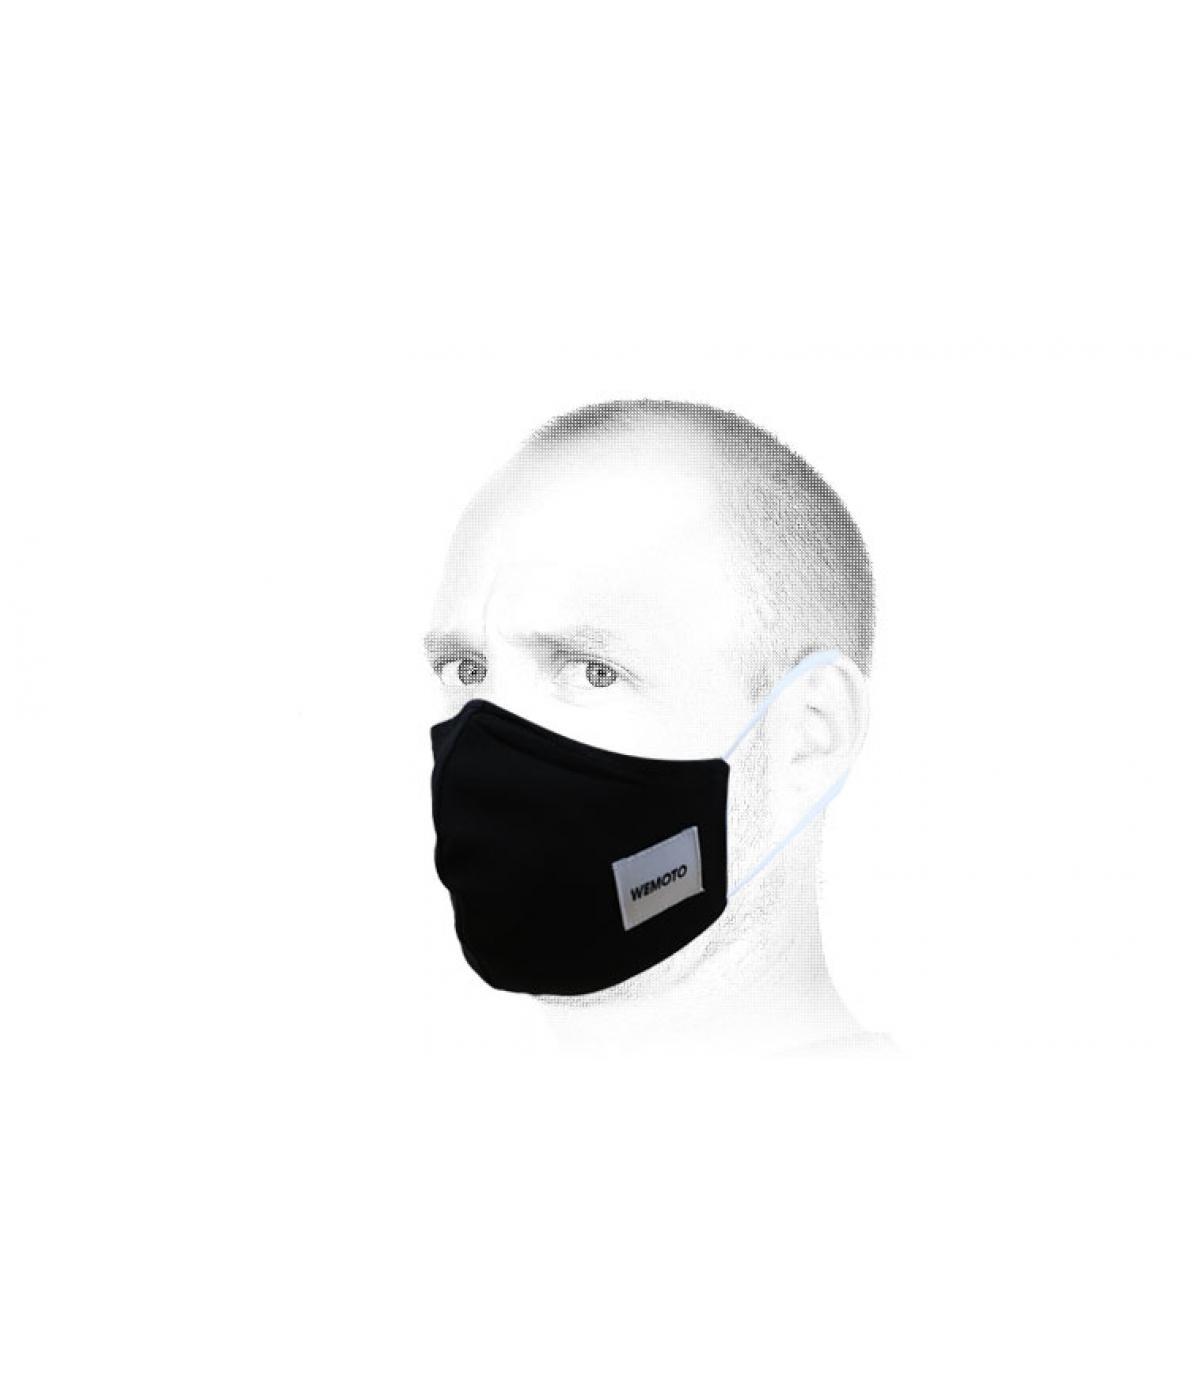 black Wemoto protective mask